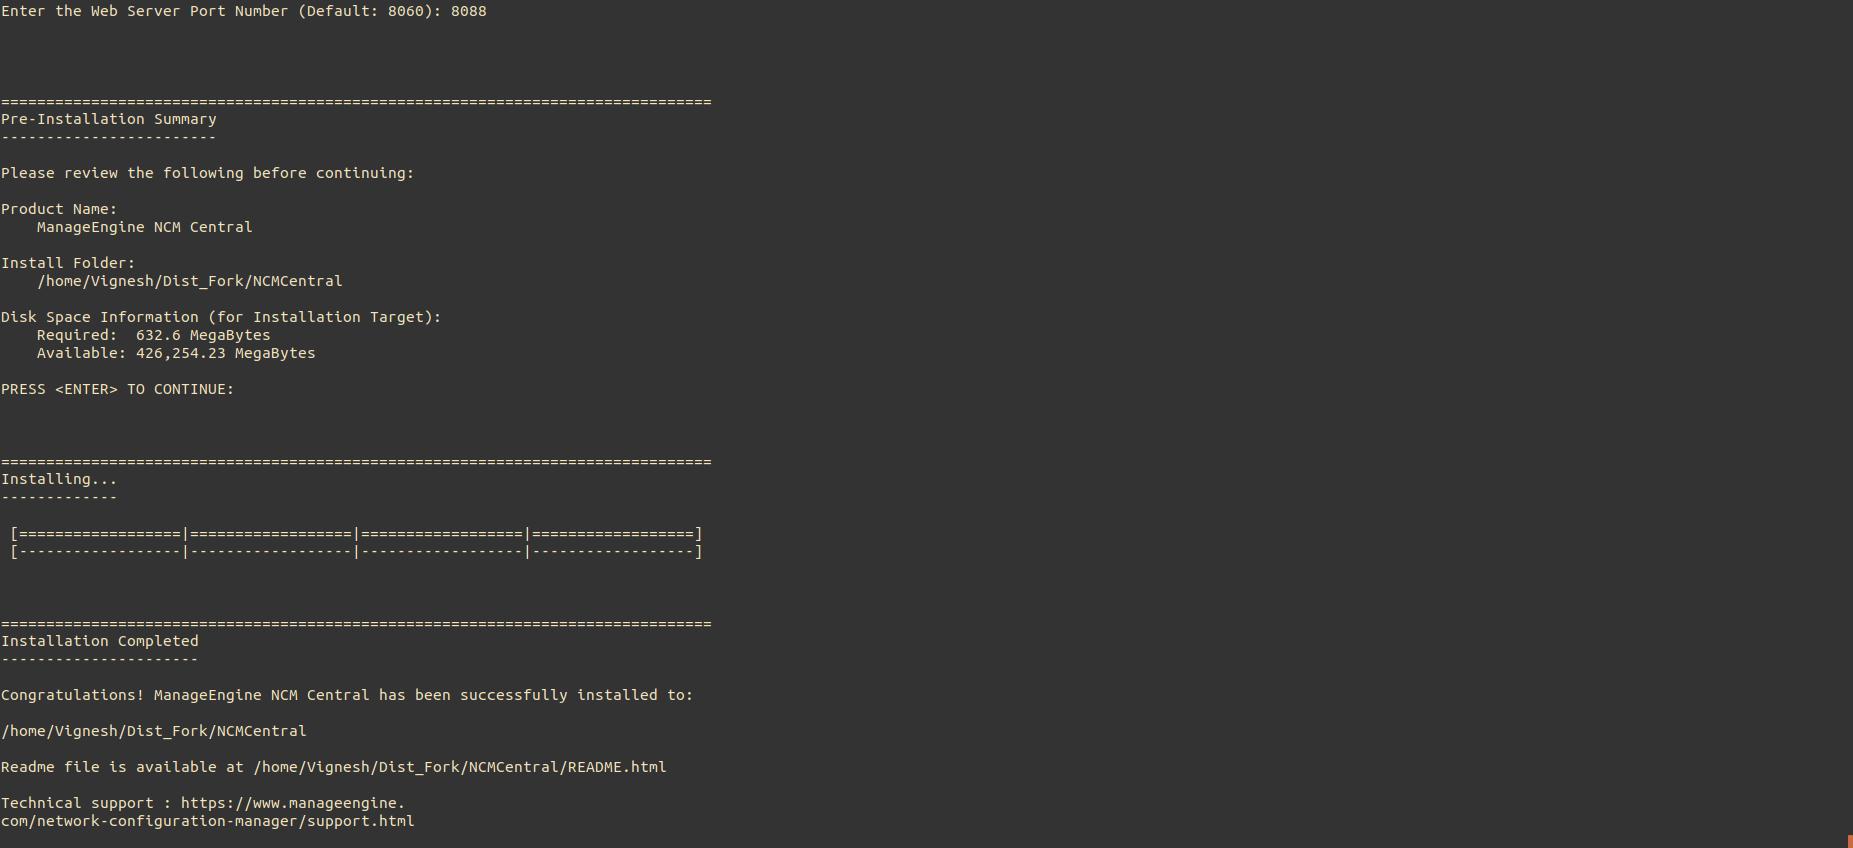 NCM Central Linux Installation Step6